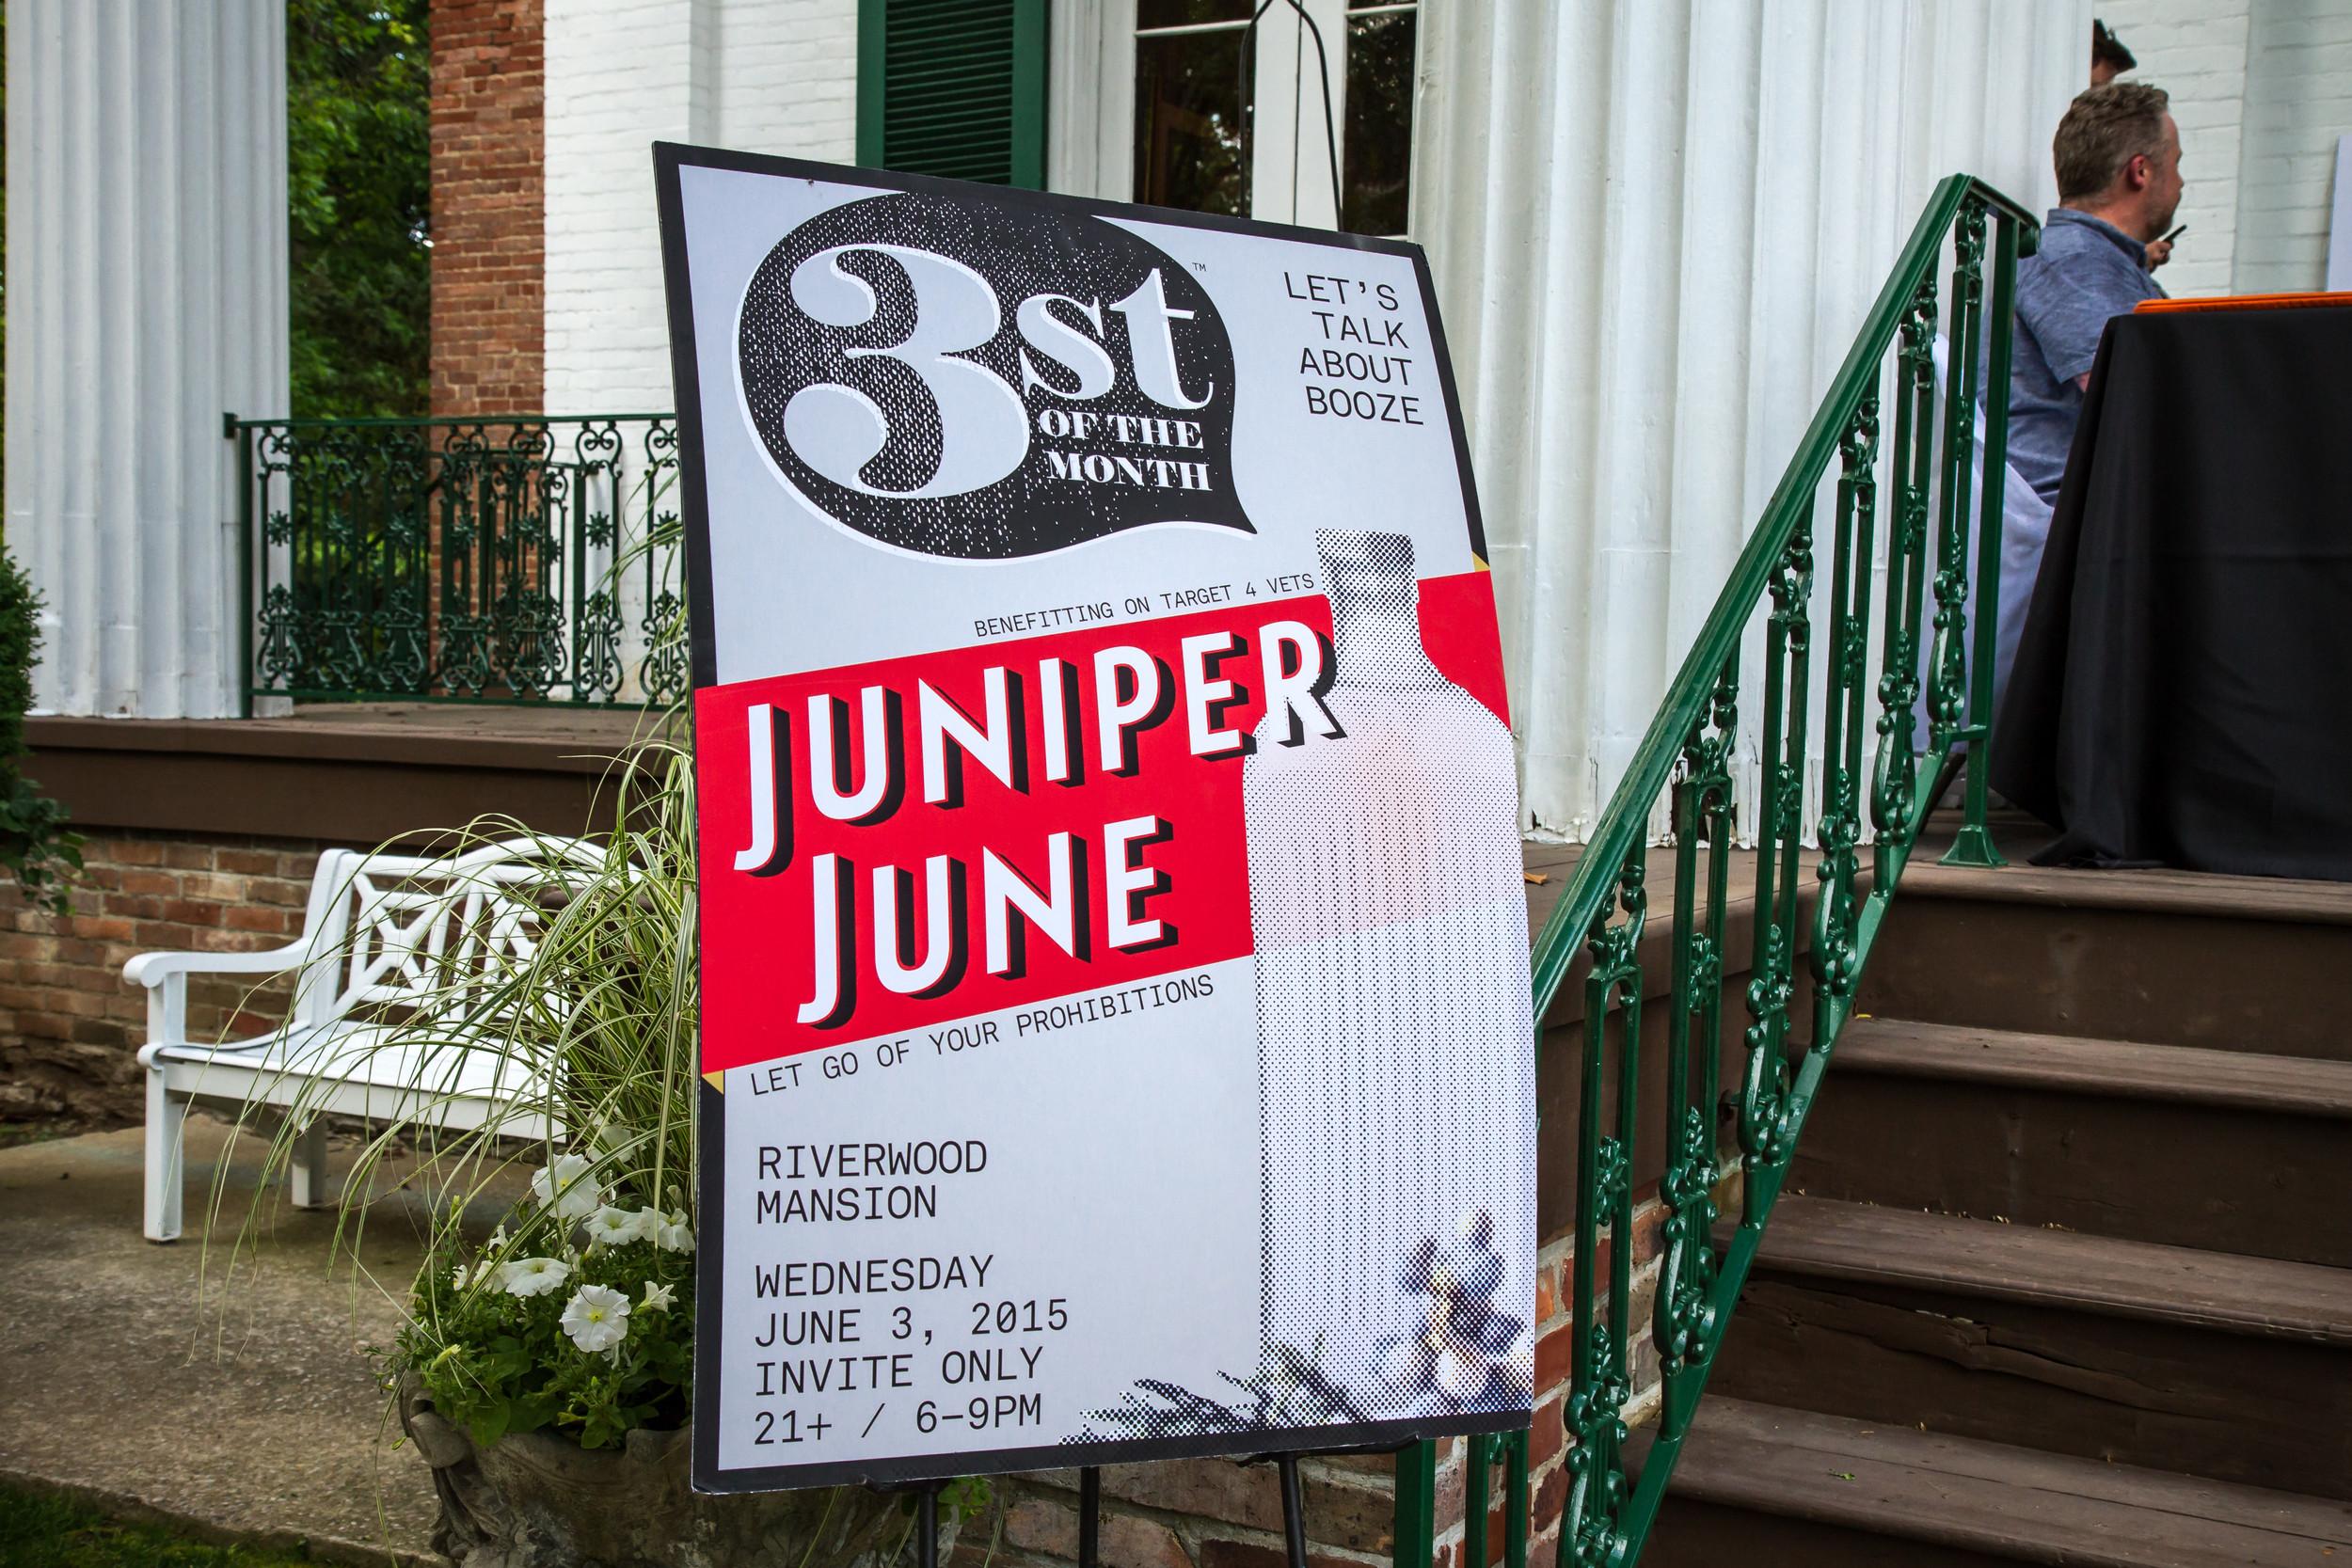 3st of the Month-Juniper June_022.jpg